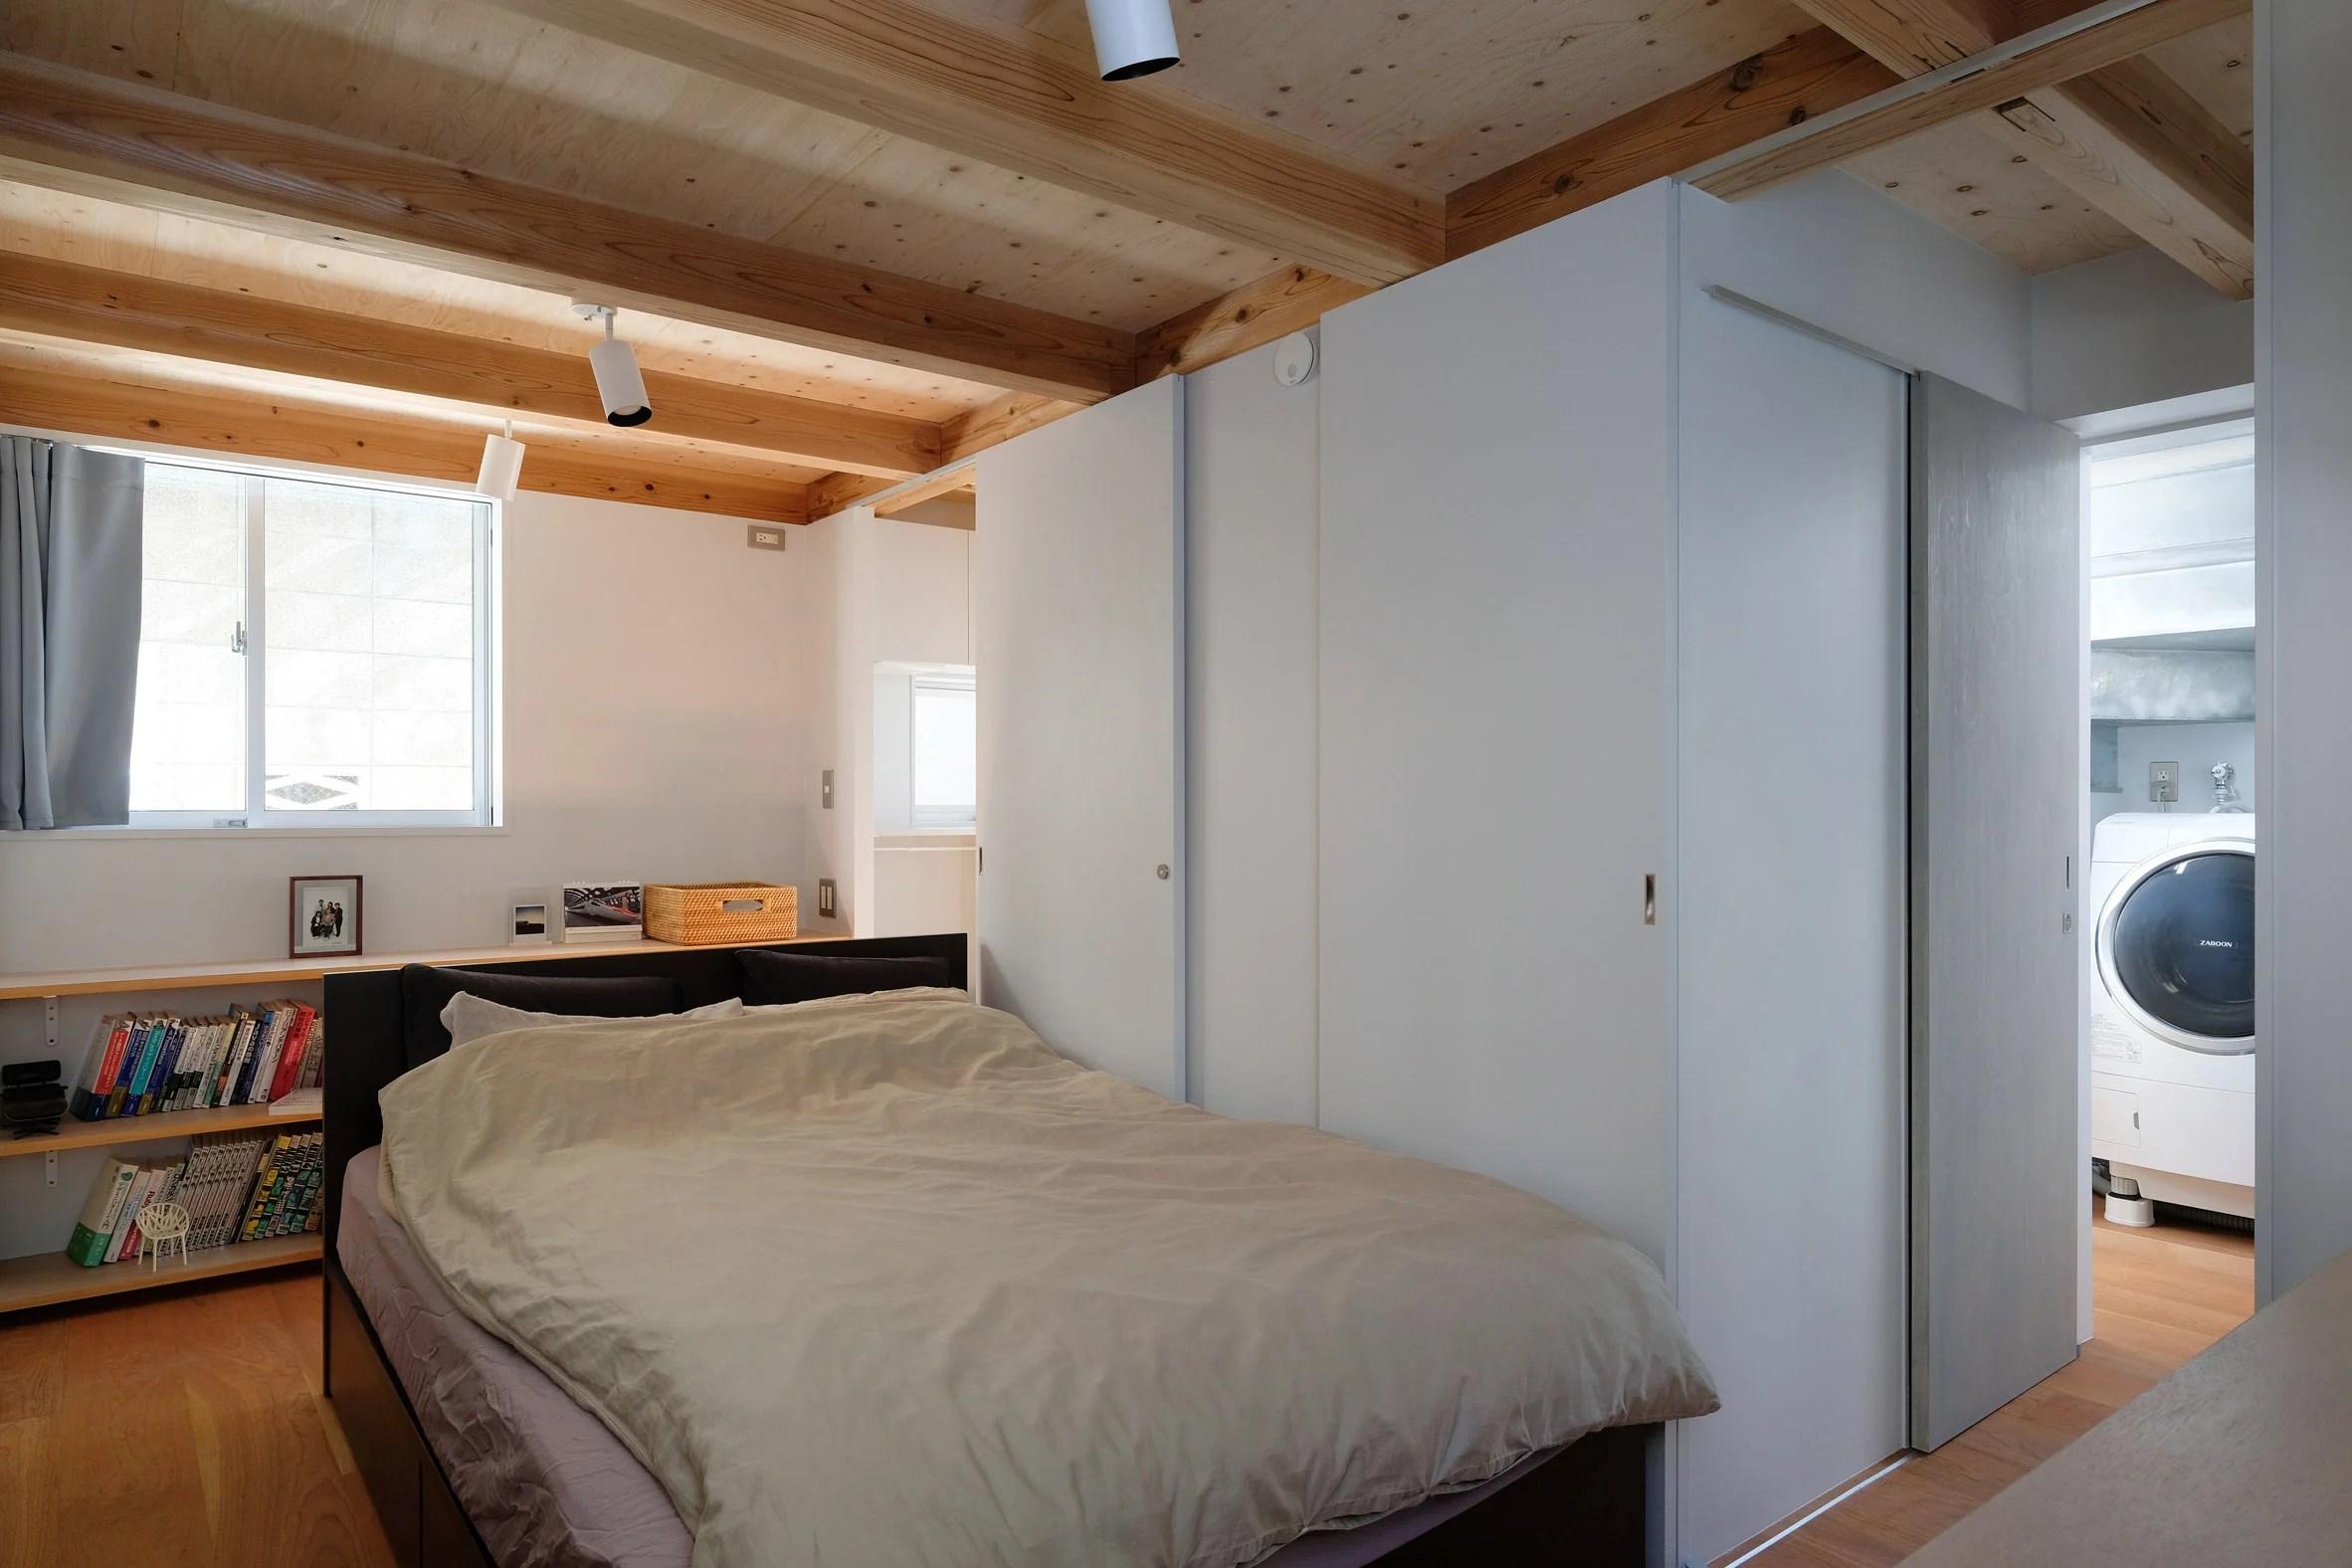 Ground floor bedroom in Japanese house